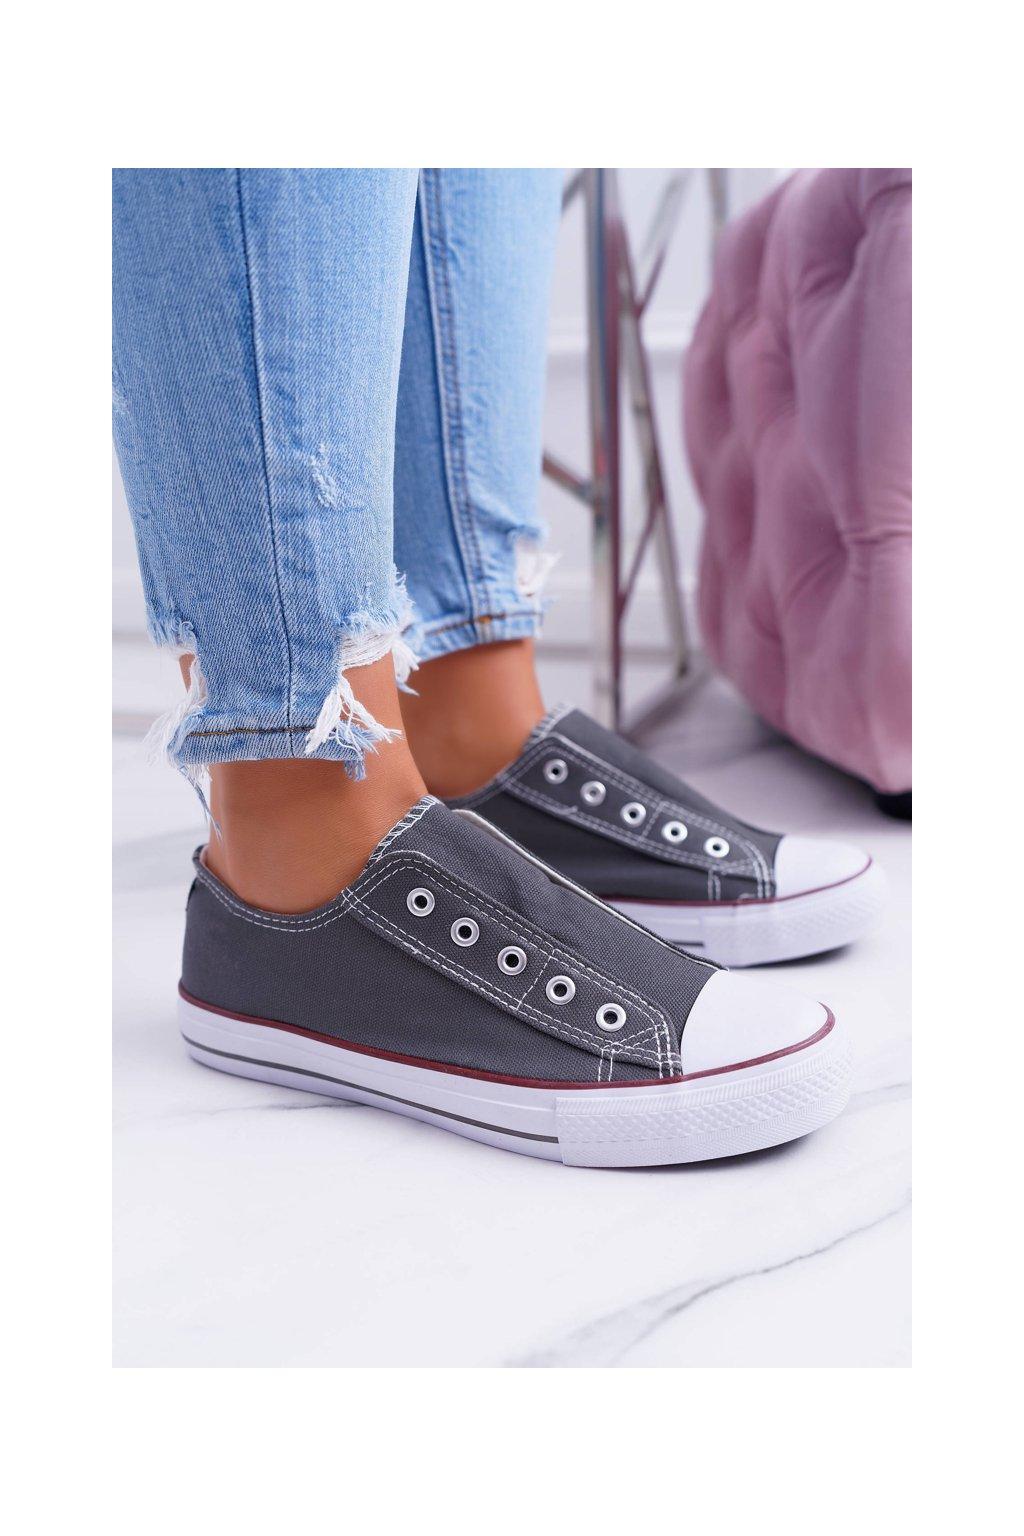 Sivé tenisky pre ženy slip-on Sneakers Crame